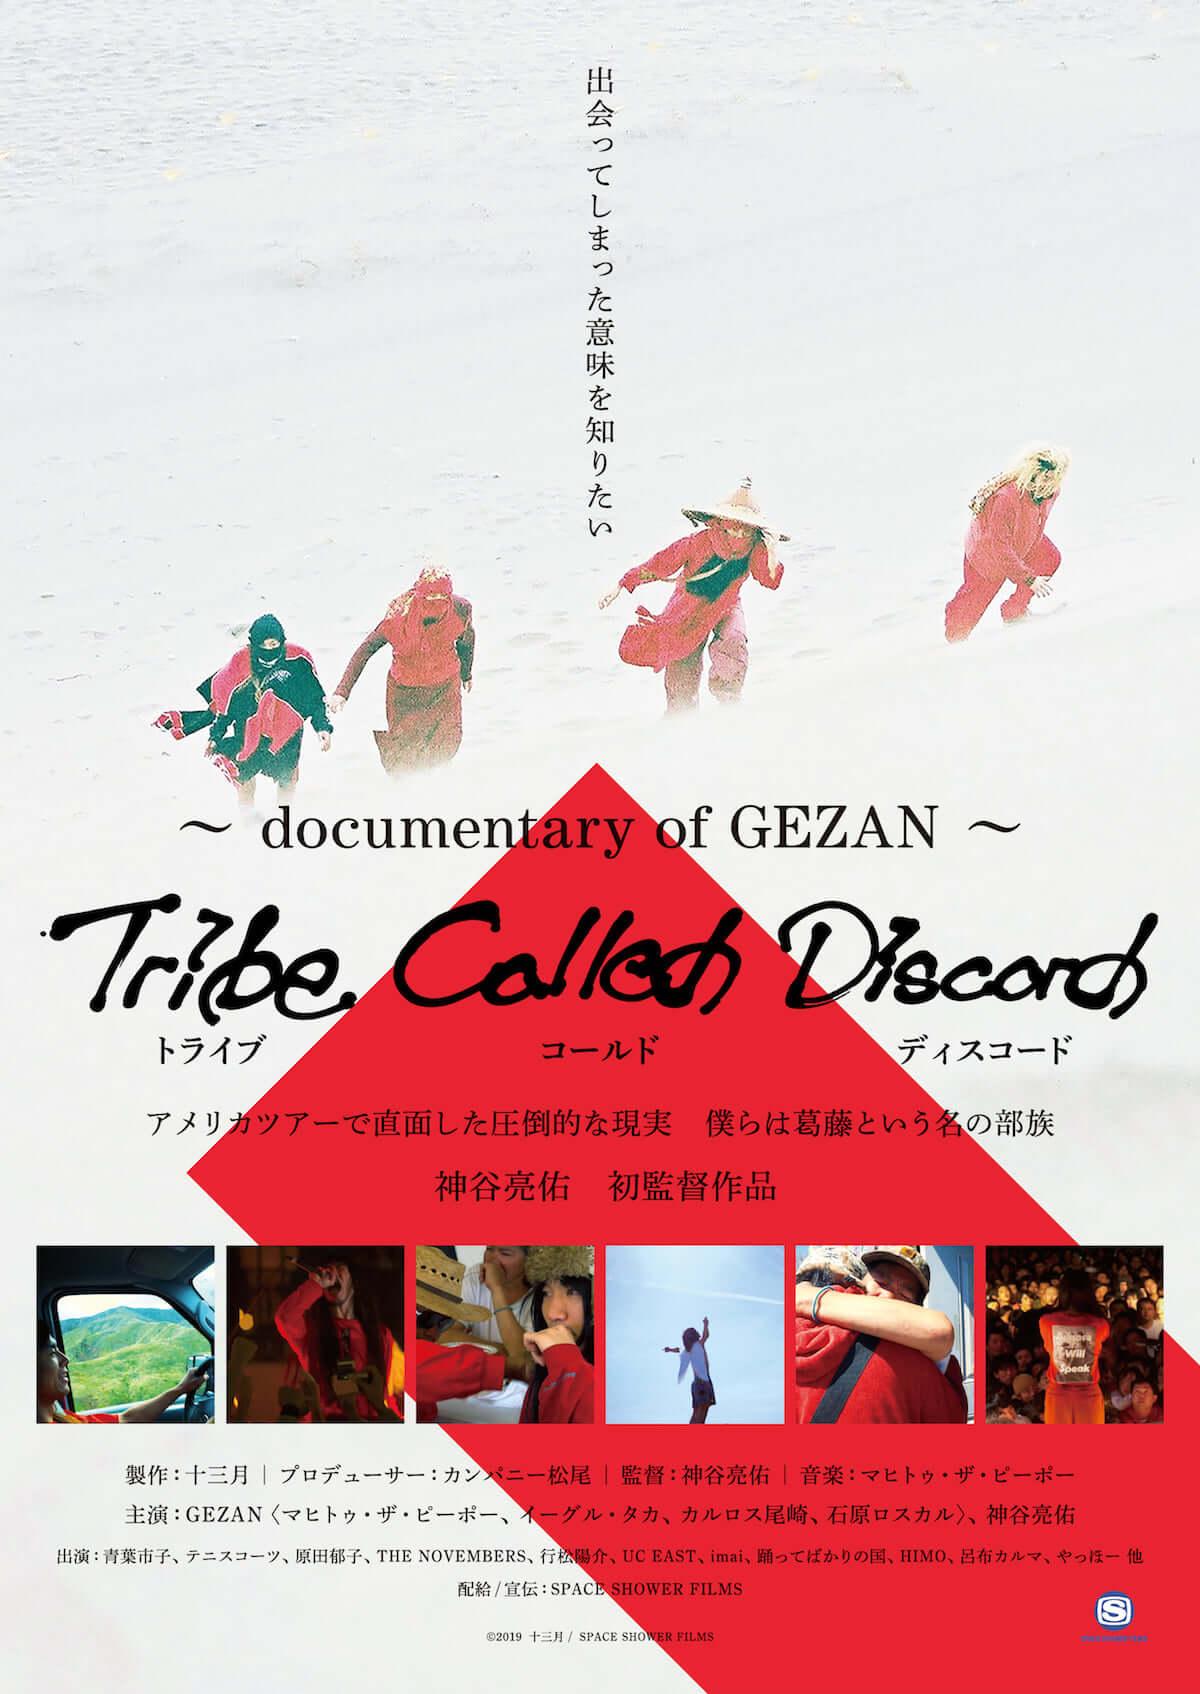 GEZAN、初のドキュメンタリー映画『Tribe Called Discord:Documentary of GEZAN』6月21日より公開決定 film190328_gezan_1-1200x1694